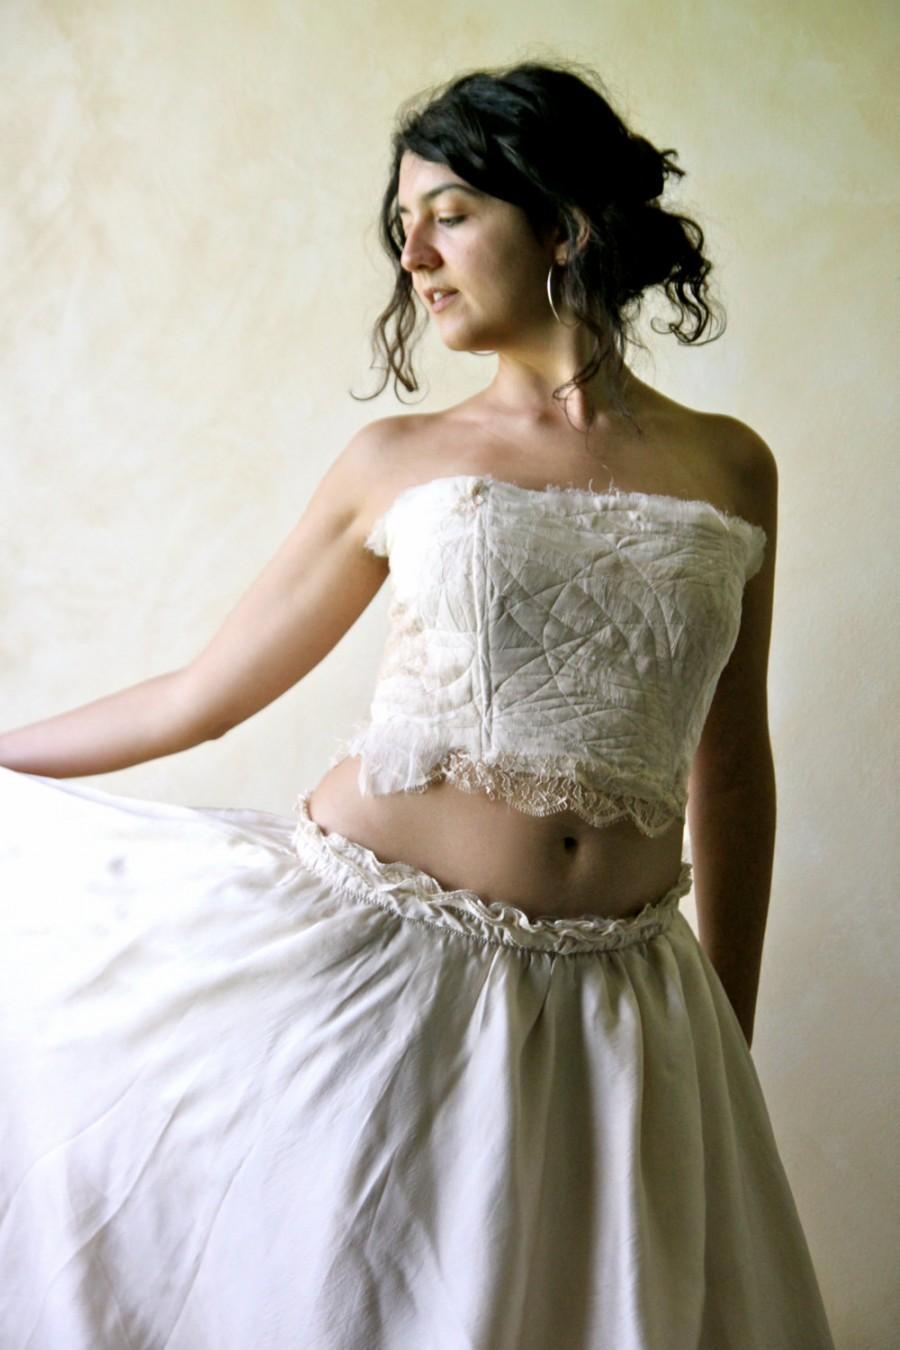 Wedding top beach wedding fairy top silk top strapless for Strapless corset bra for wedding dress